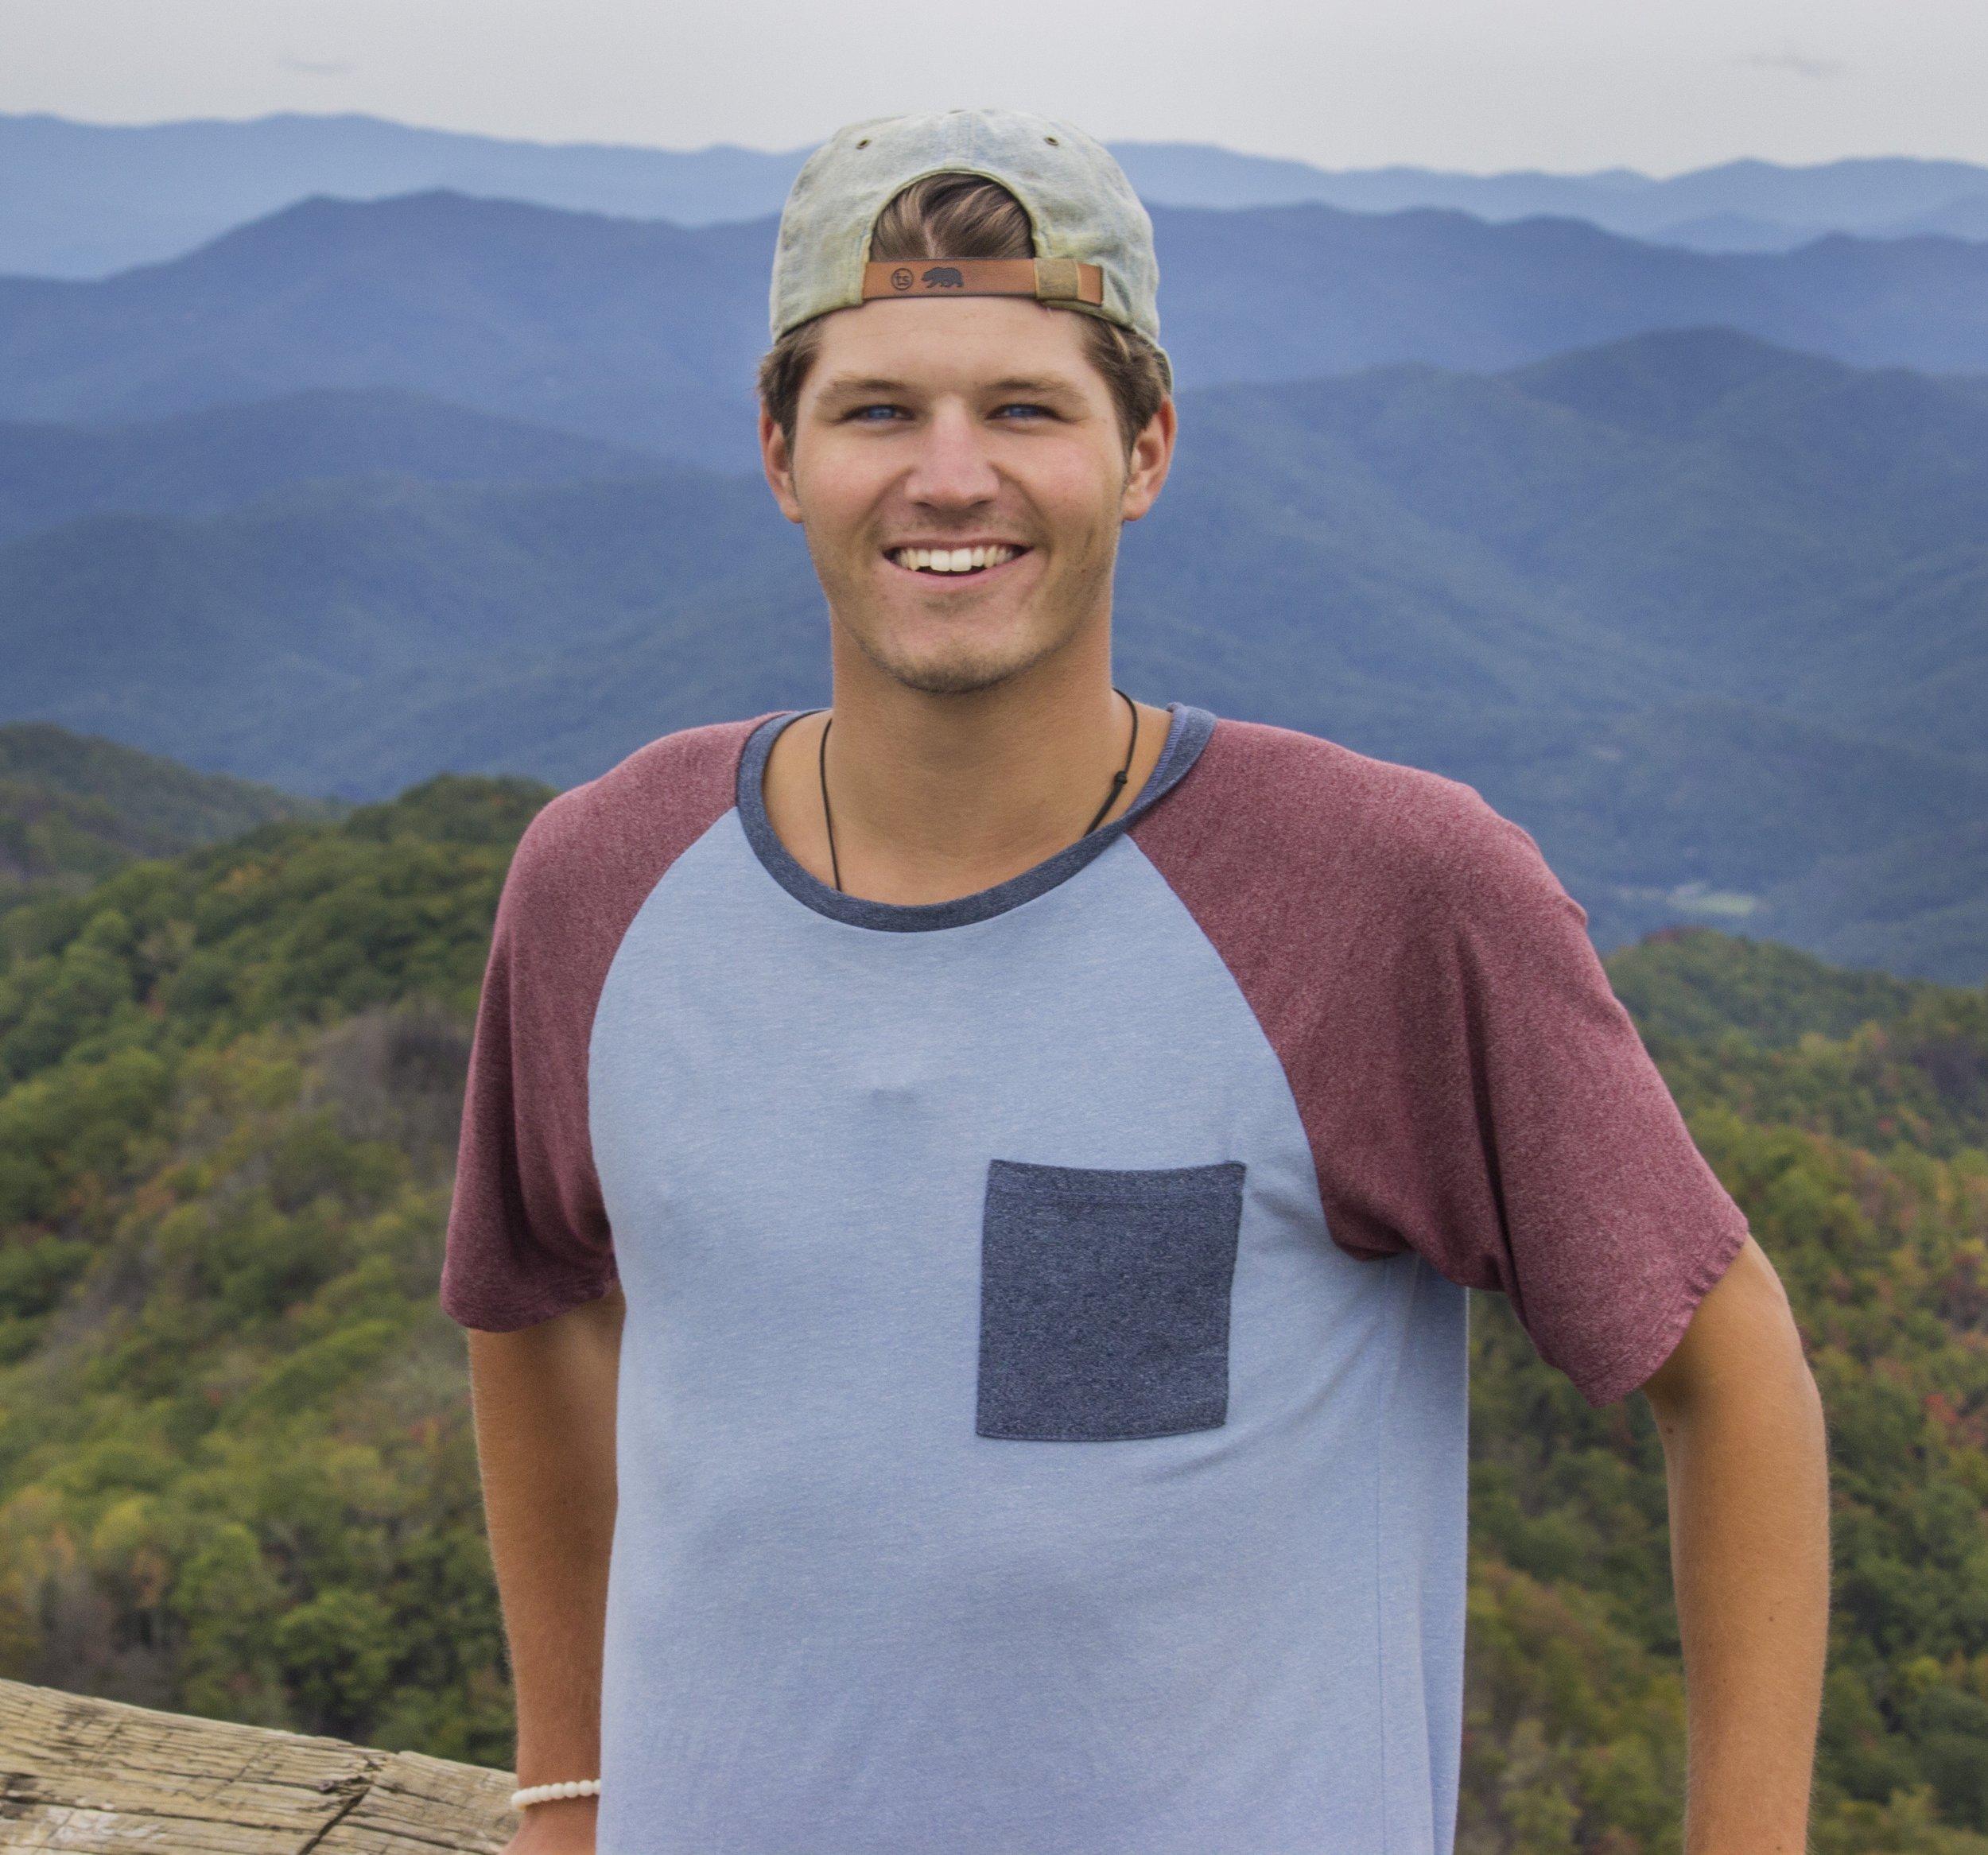 Portrait photograph of Nick Knapper of the Vativ Media team.